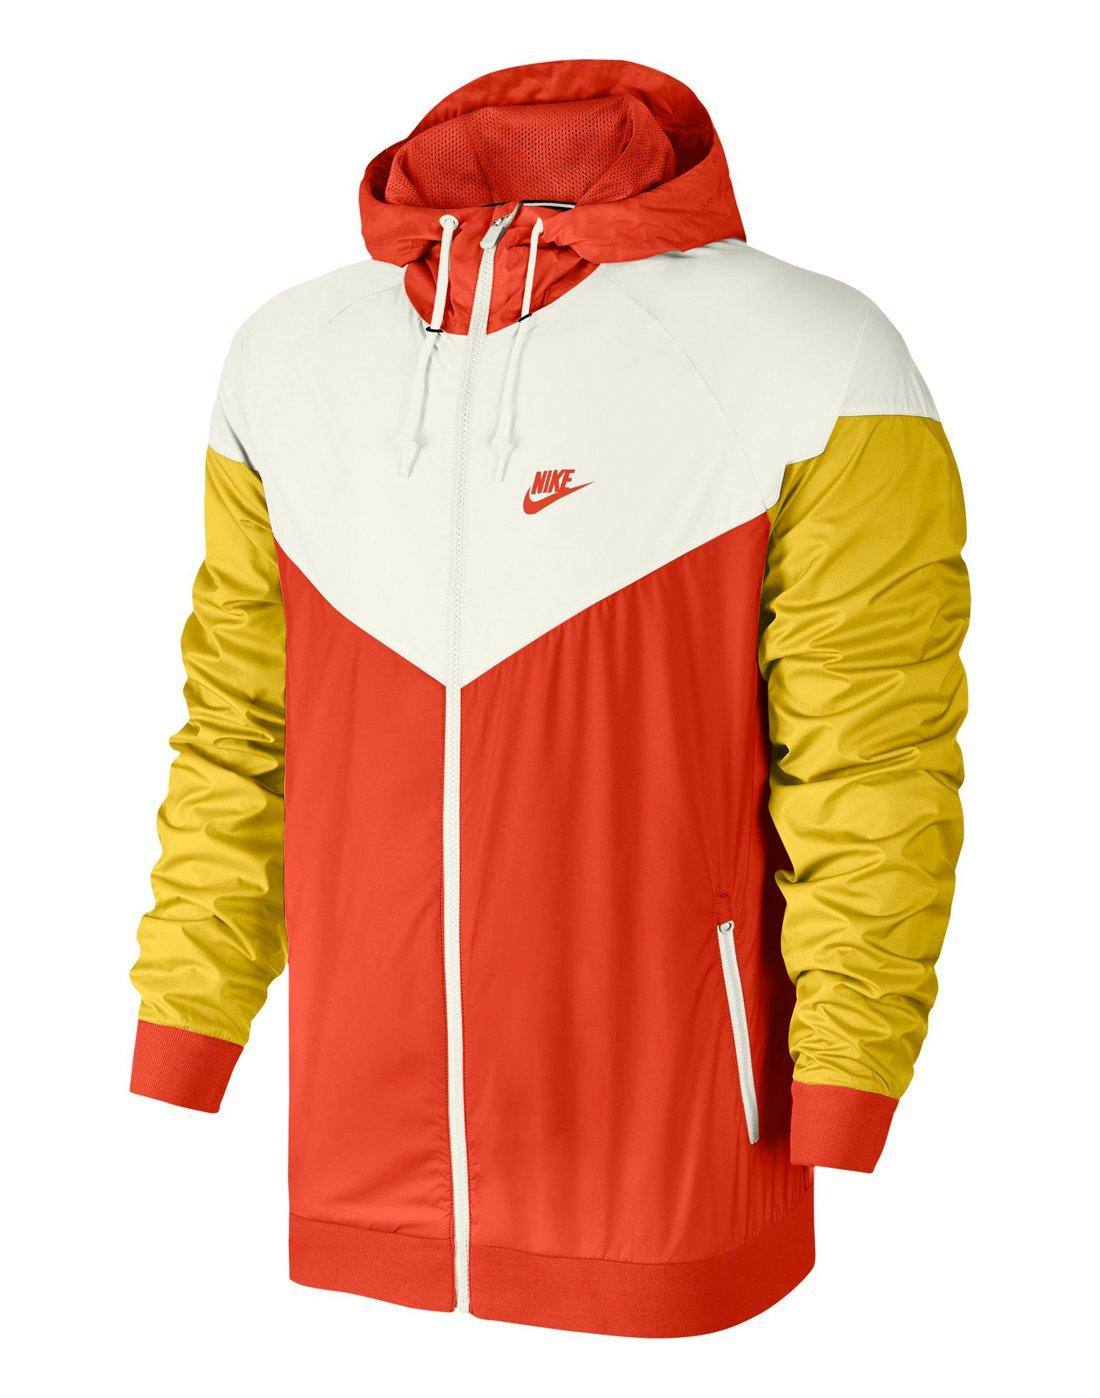 c00bbdefa772 Men  Nike Windrunner Jacket